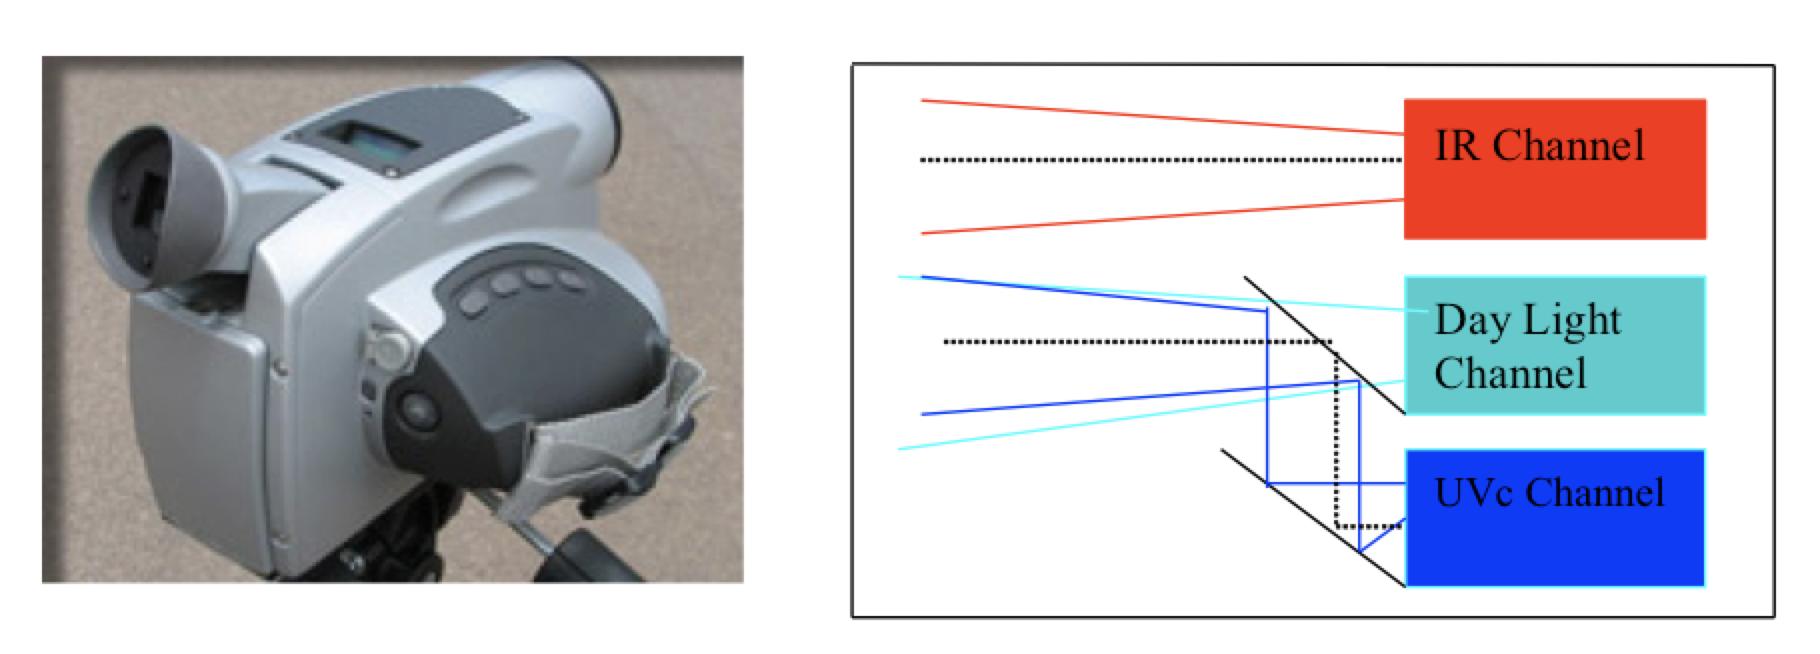 composite insulator Comparison of Methodologies to Detect Damaged Composite Insulators View and principle of operation right of multi camera UVIR